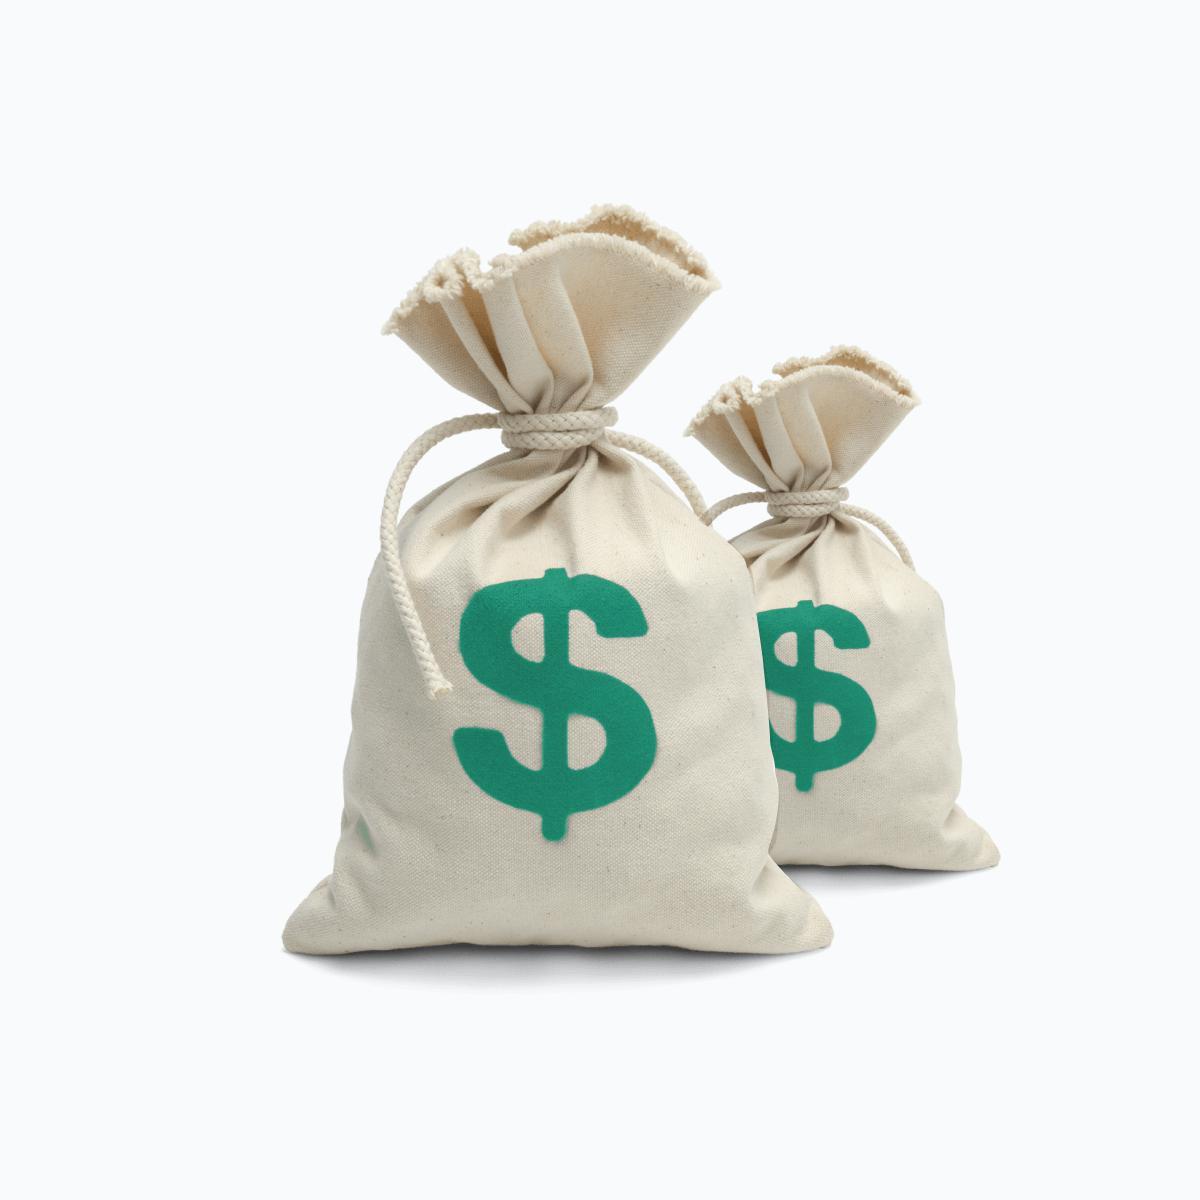 Moneylion personal loan advice